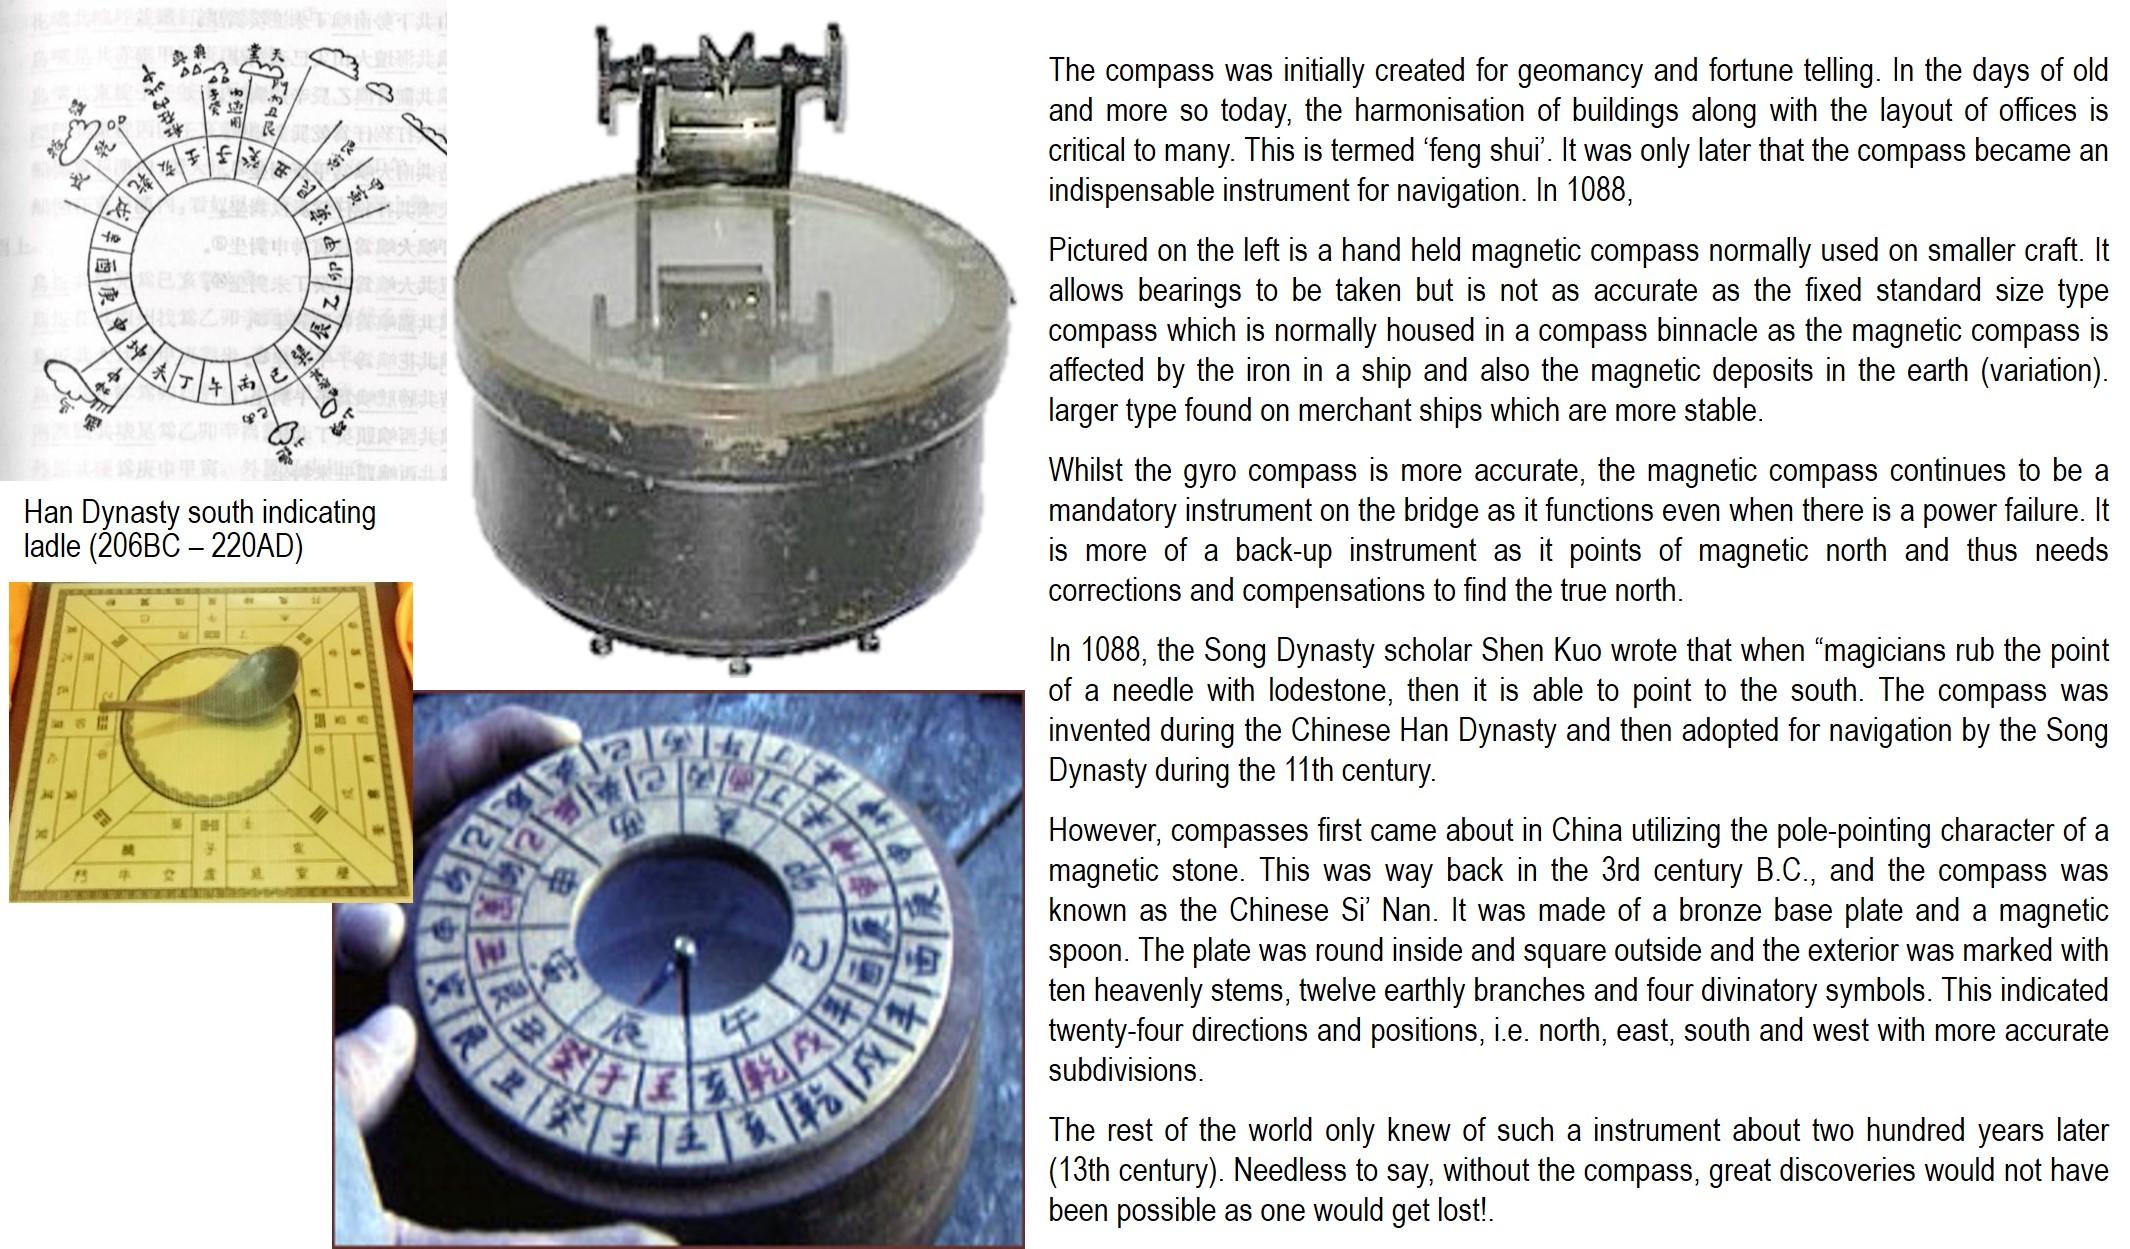 Item #35: Handheld Magnetic Compass | Maritime Heritage eMuseum